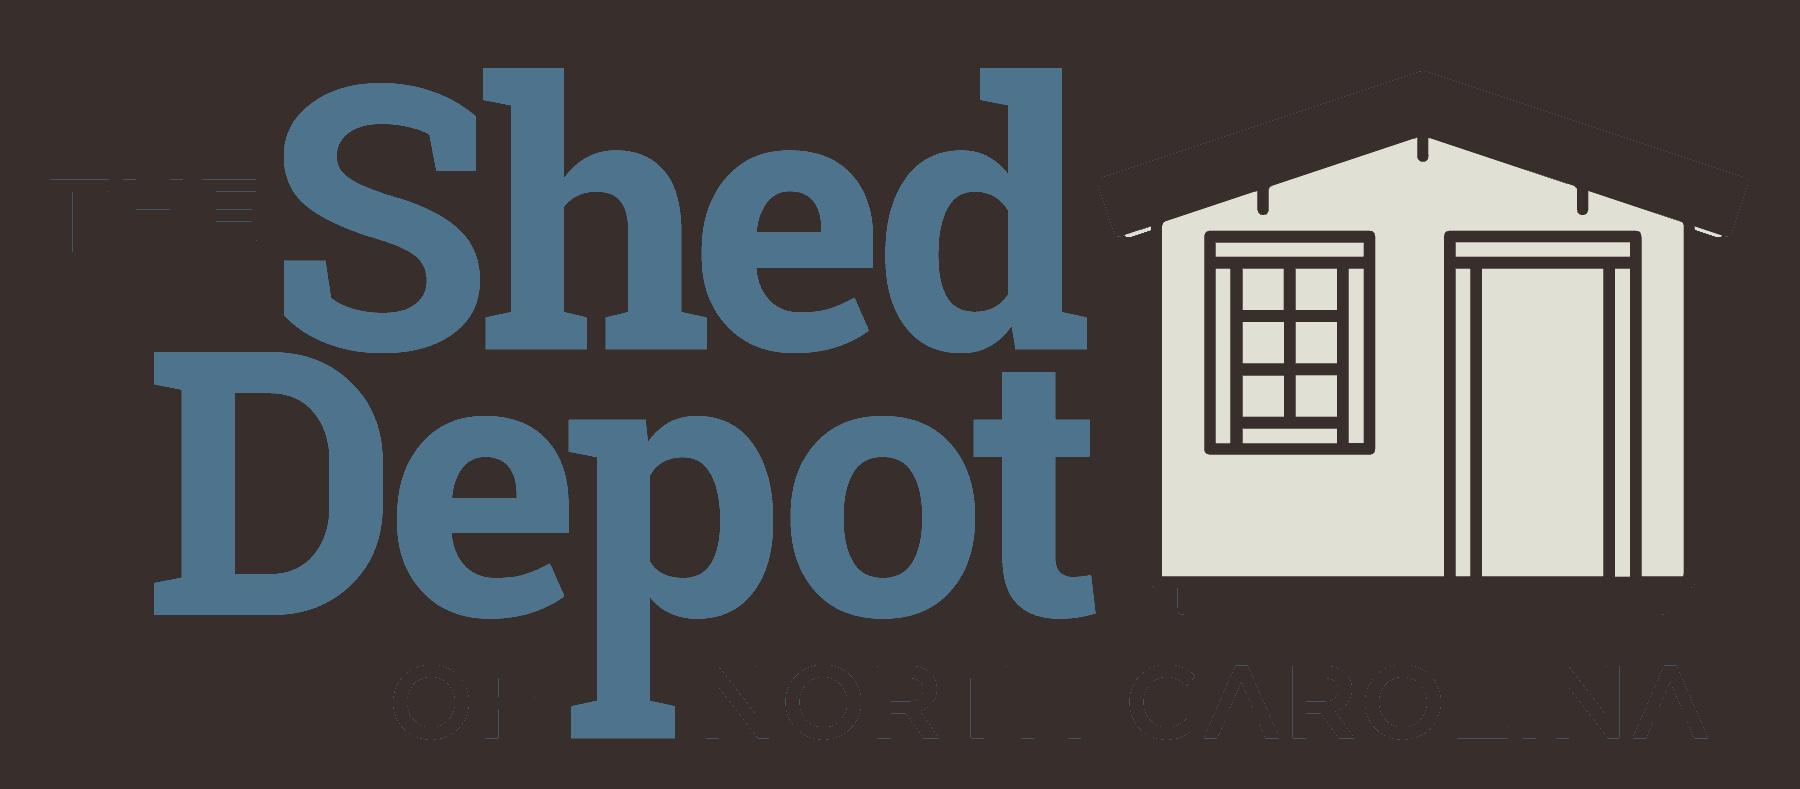 Shed Depot Logo